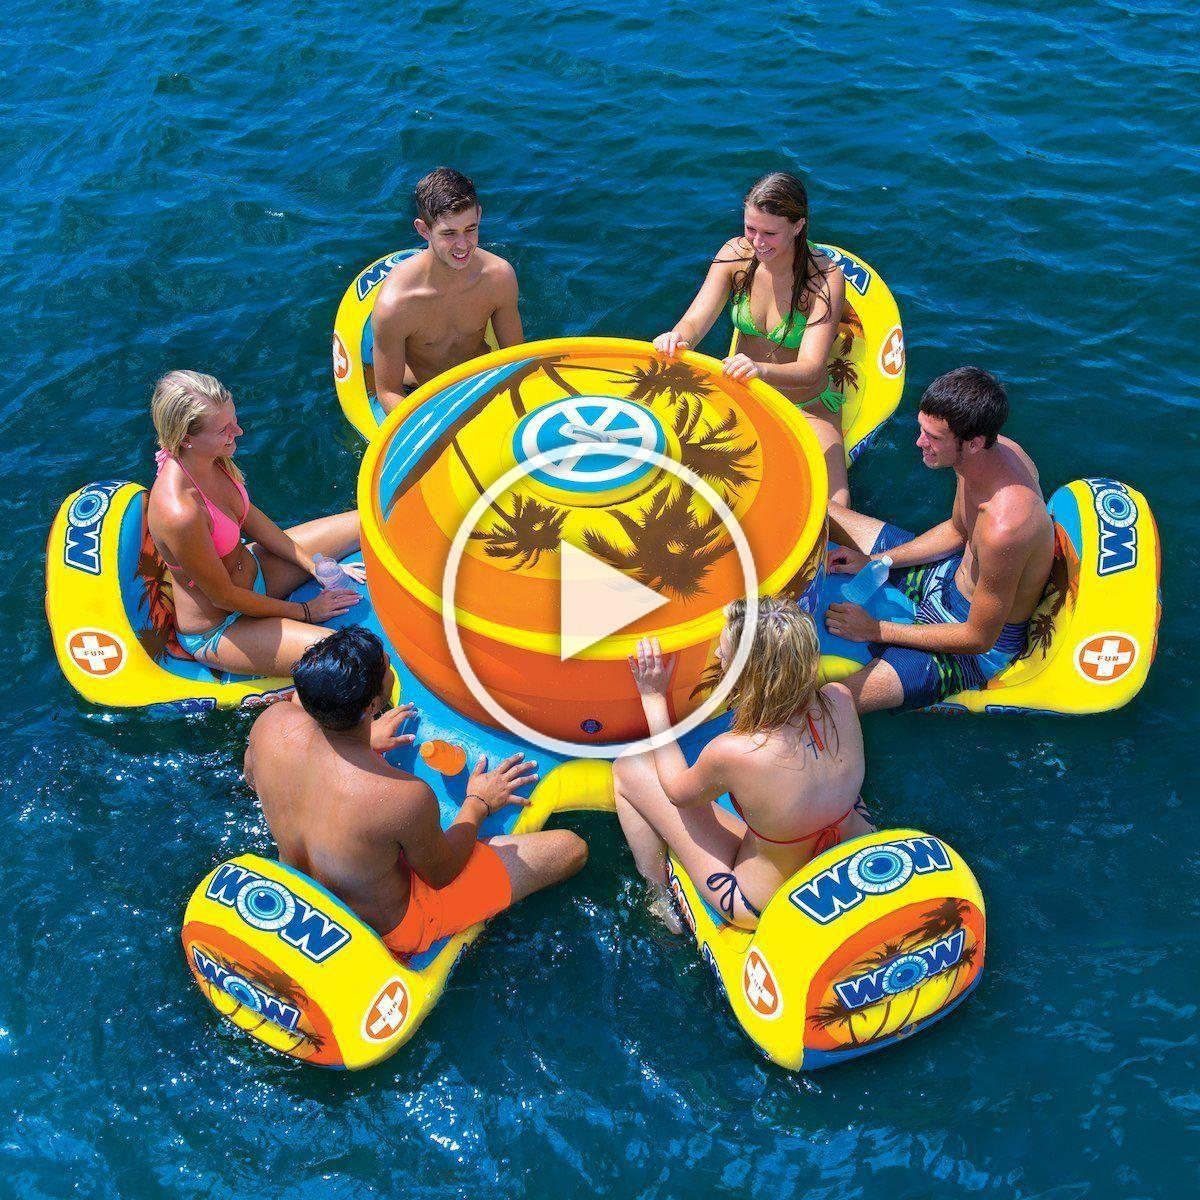 WOW World of Watersports Stadium Islander HUGE Heavy Duty Floating Island with